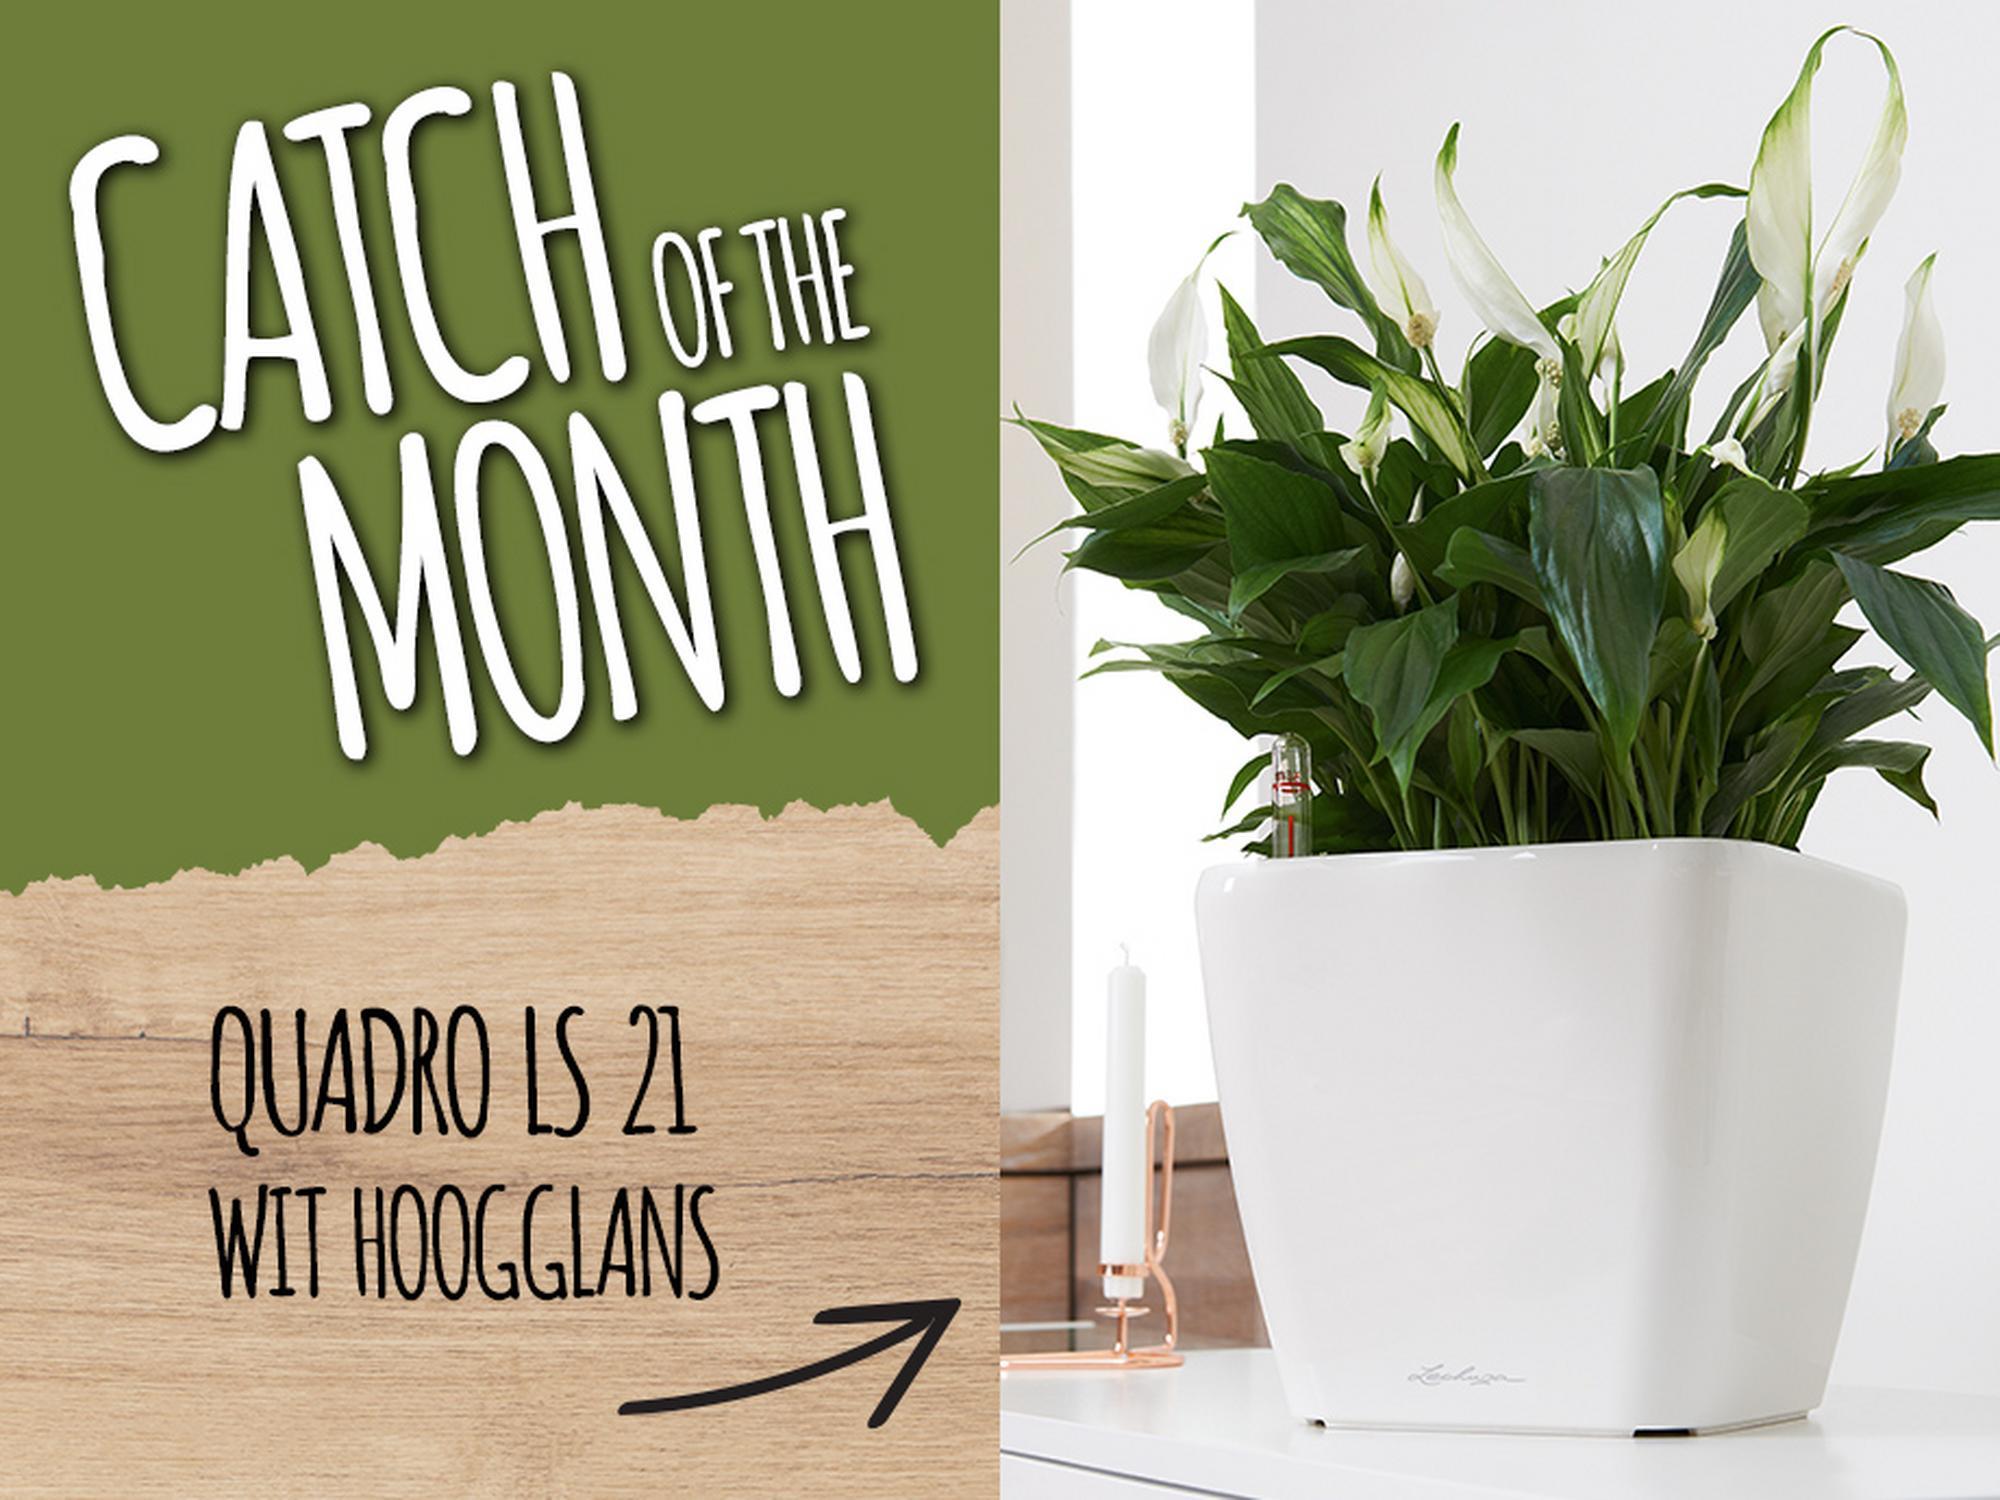 Catch of the Month: 15% korting op de QUADRO LS 21 wit hoogglans